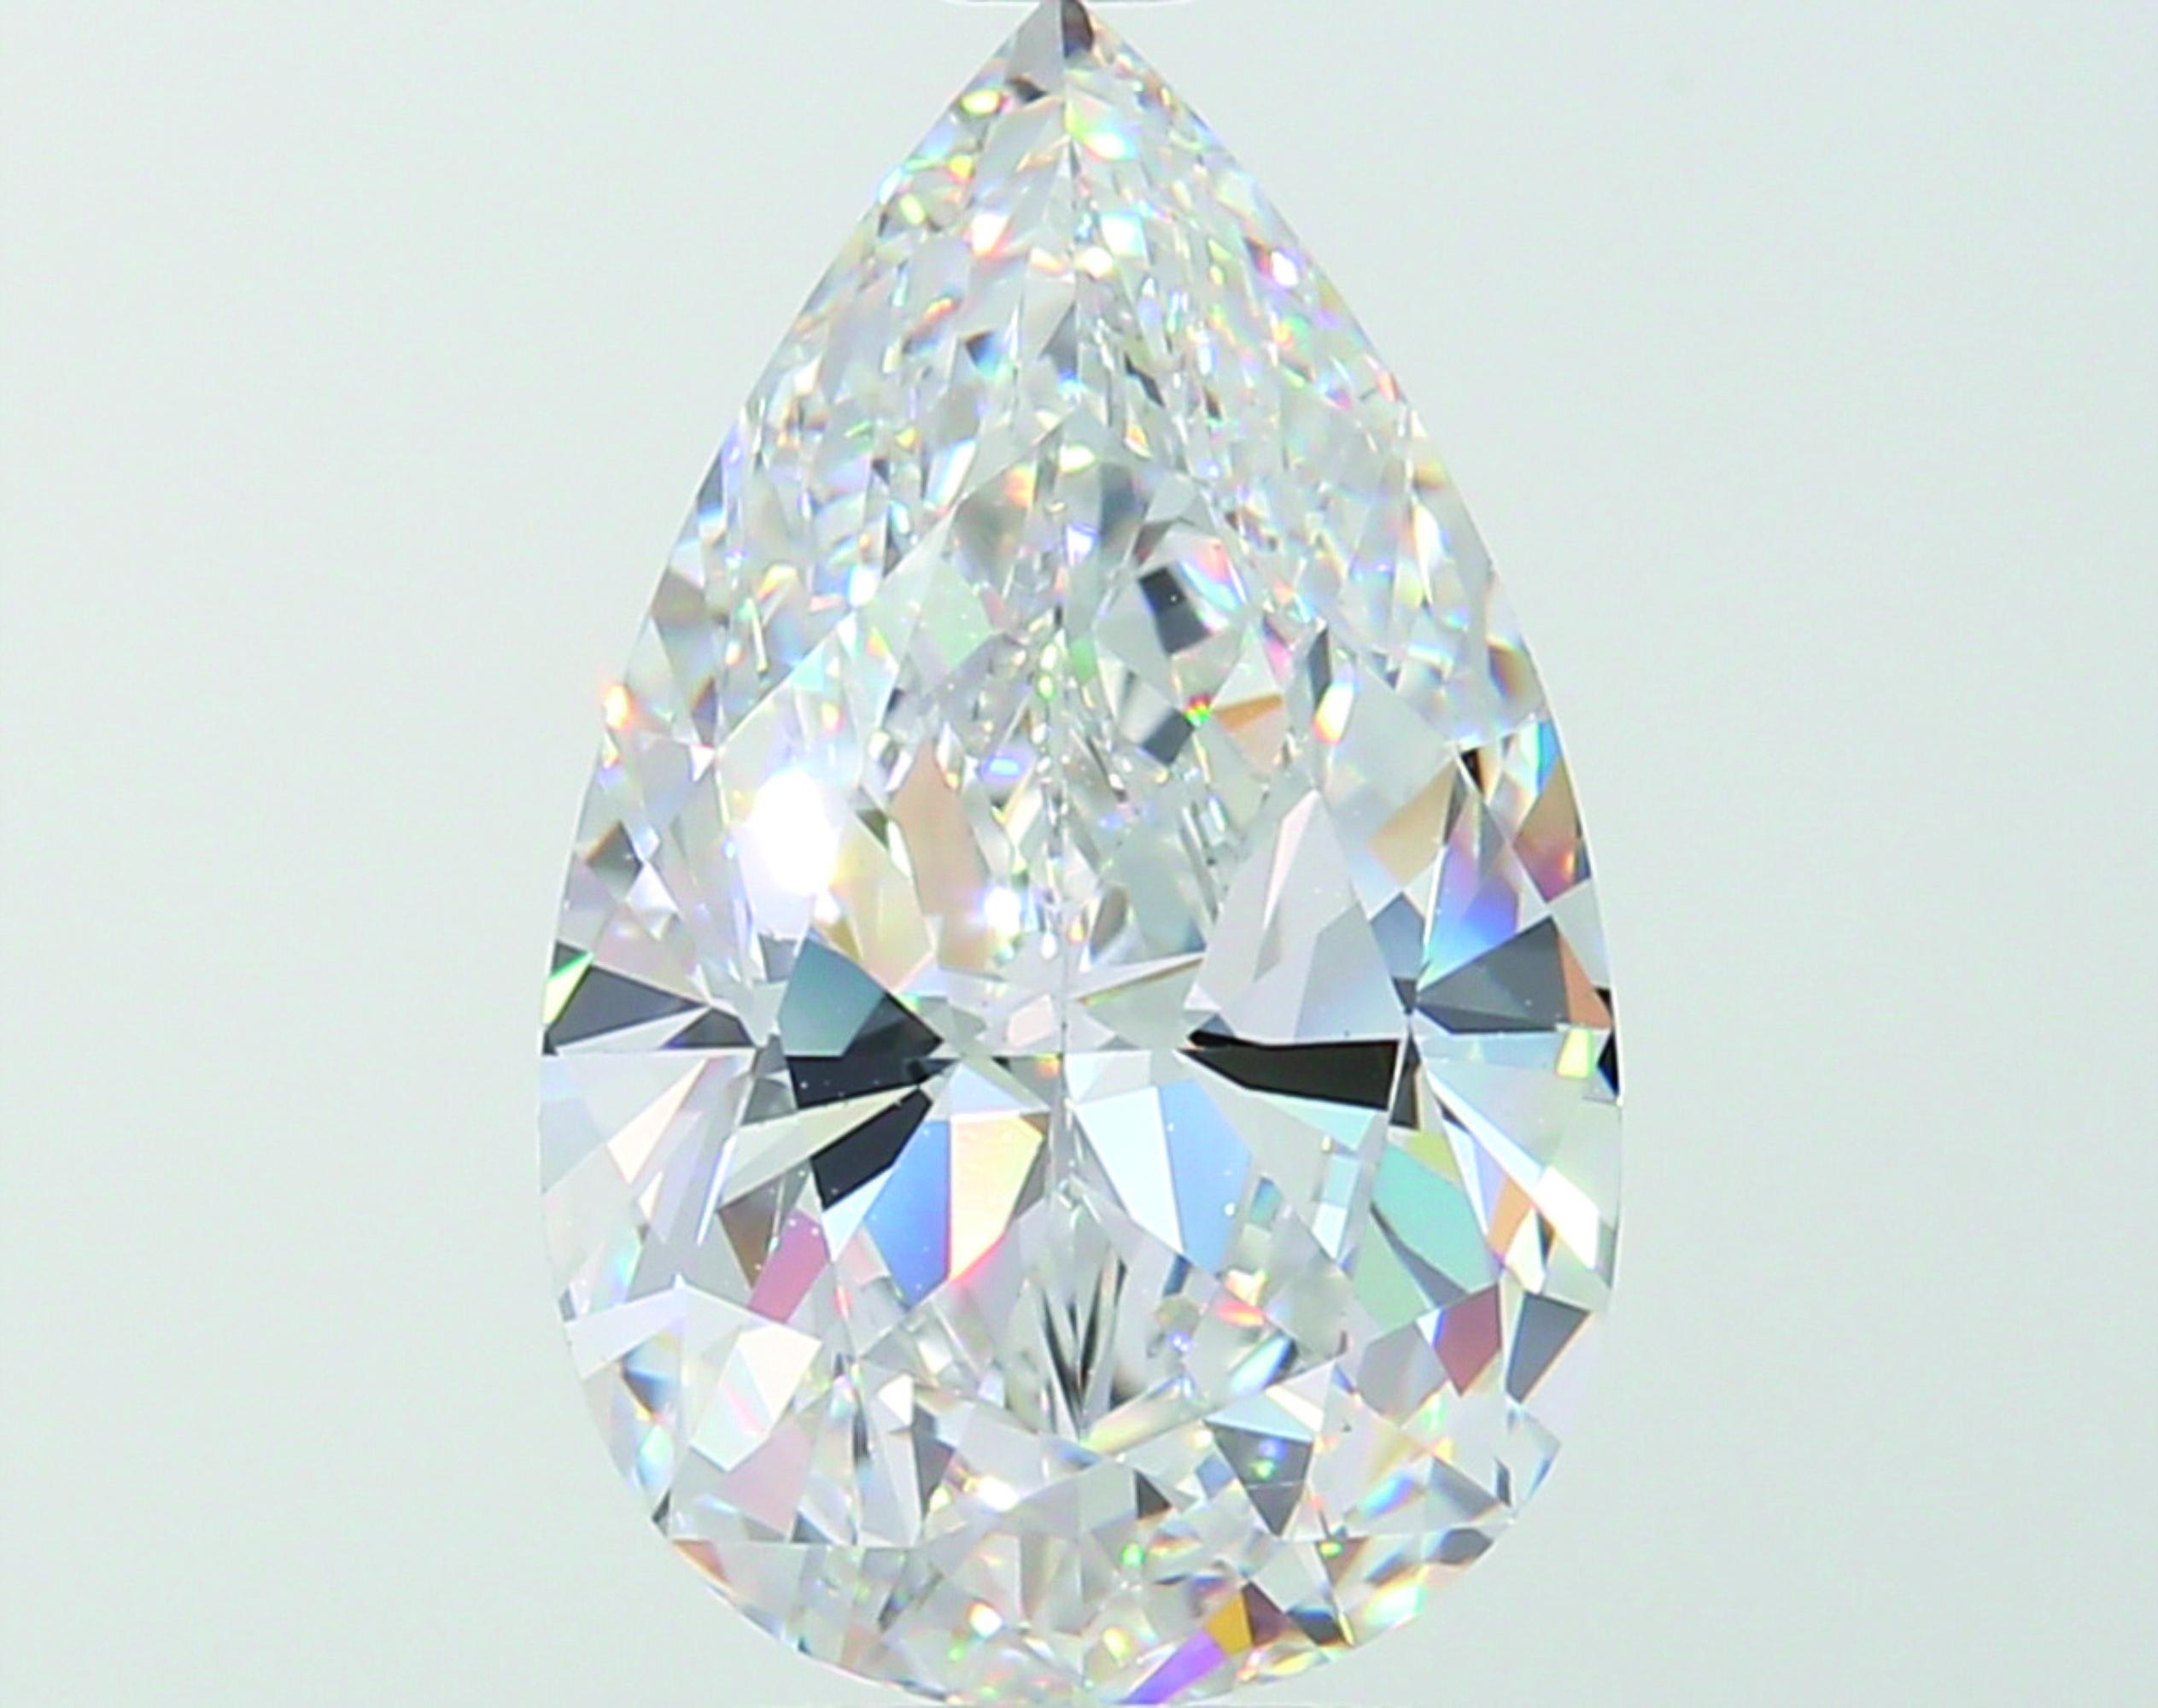 A 3.00 Carat Pear-Shaped Diamond, D Color, VS1 Clarity